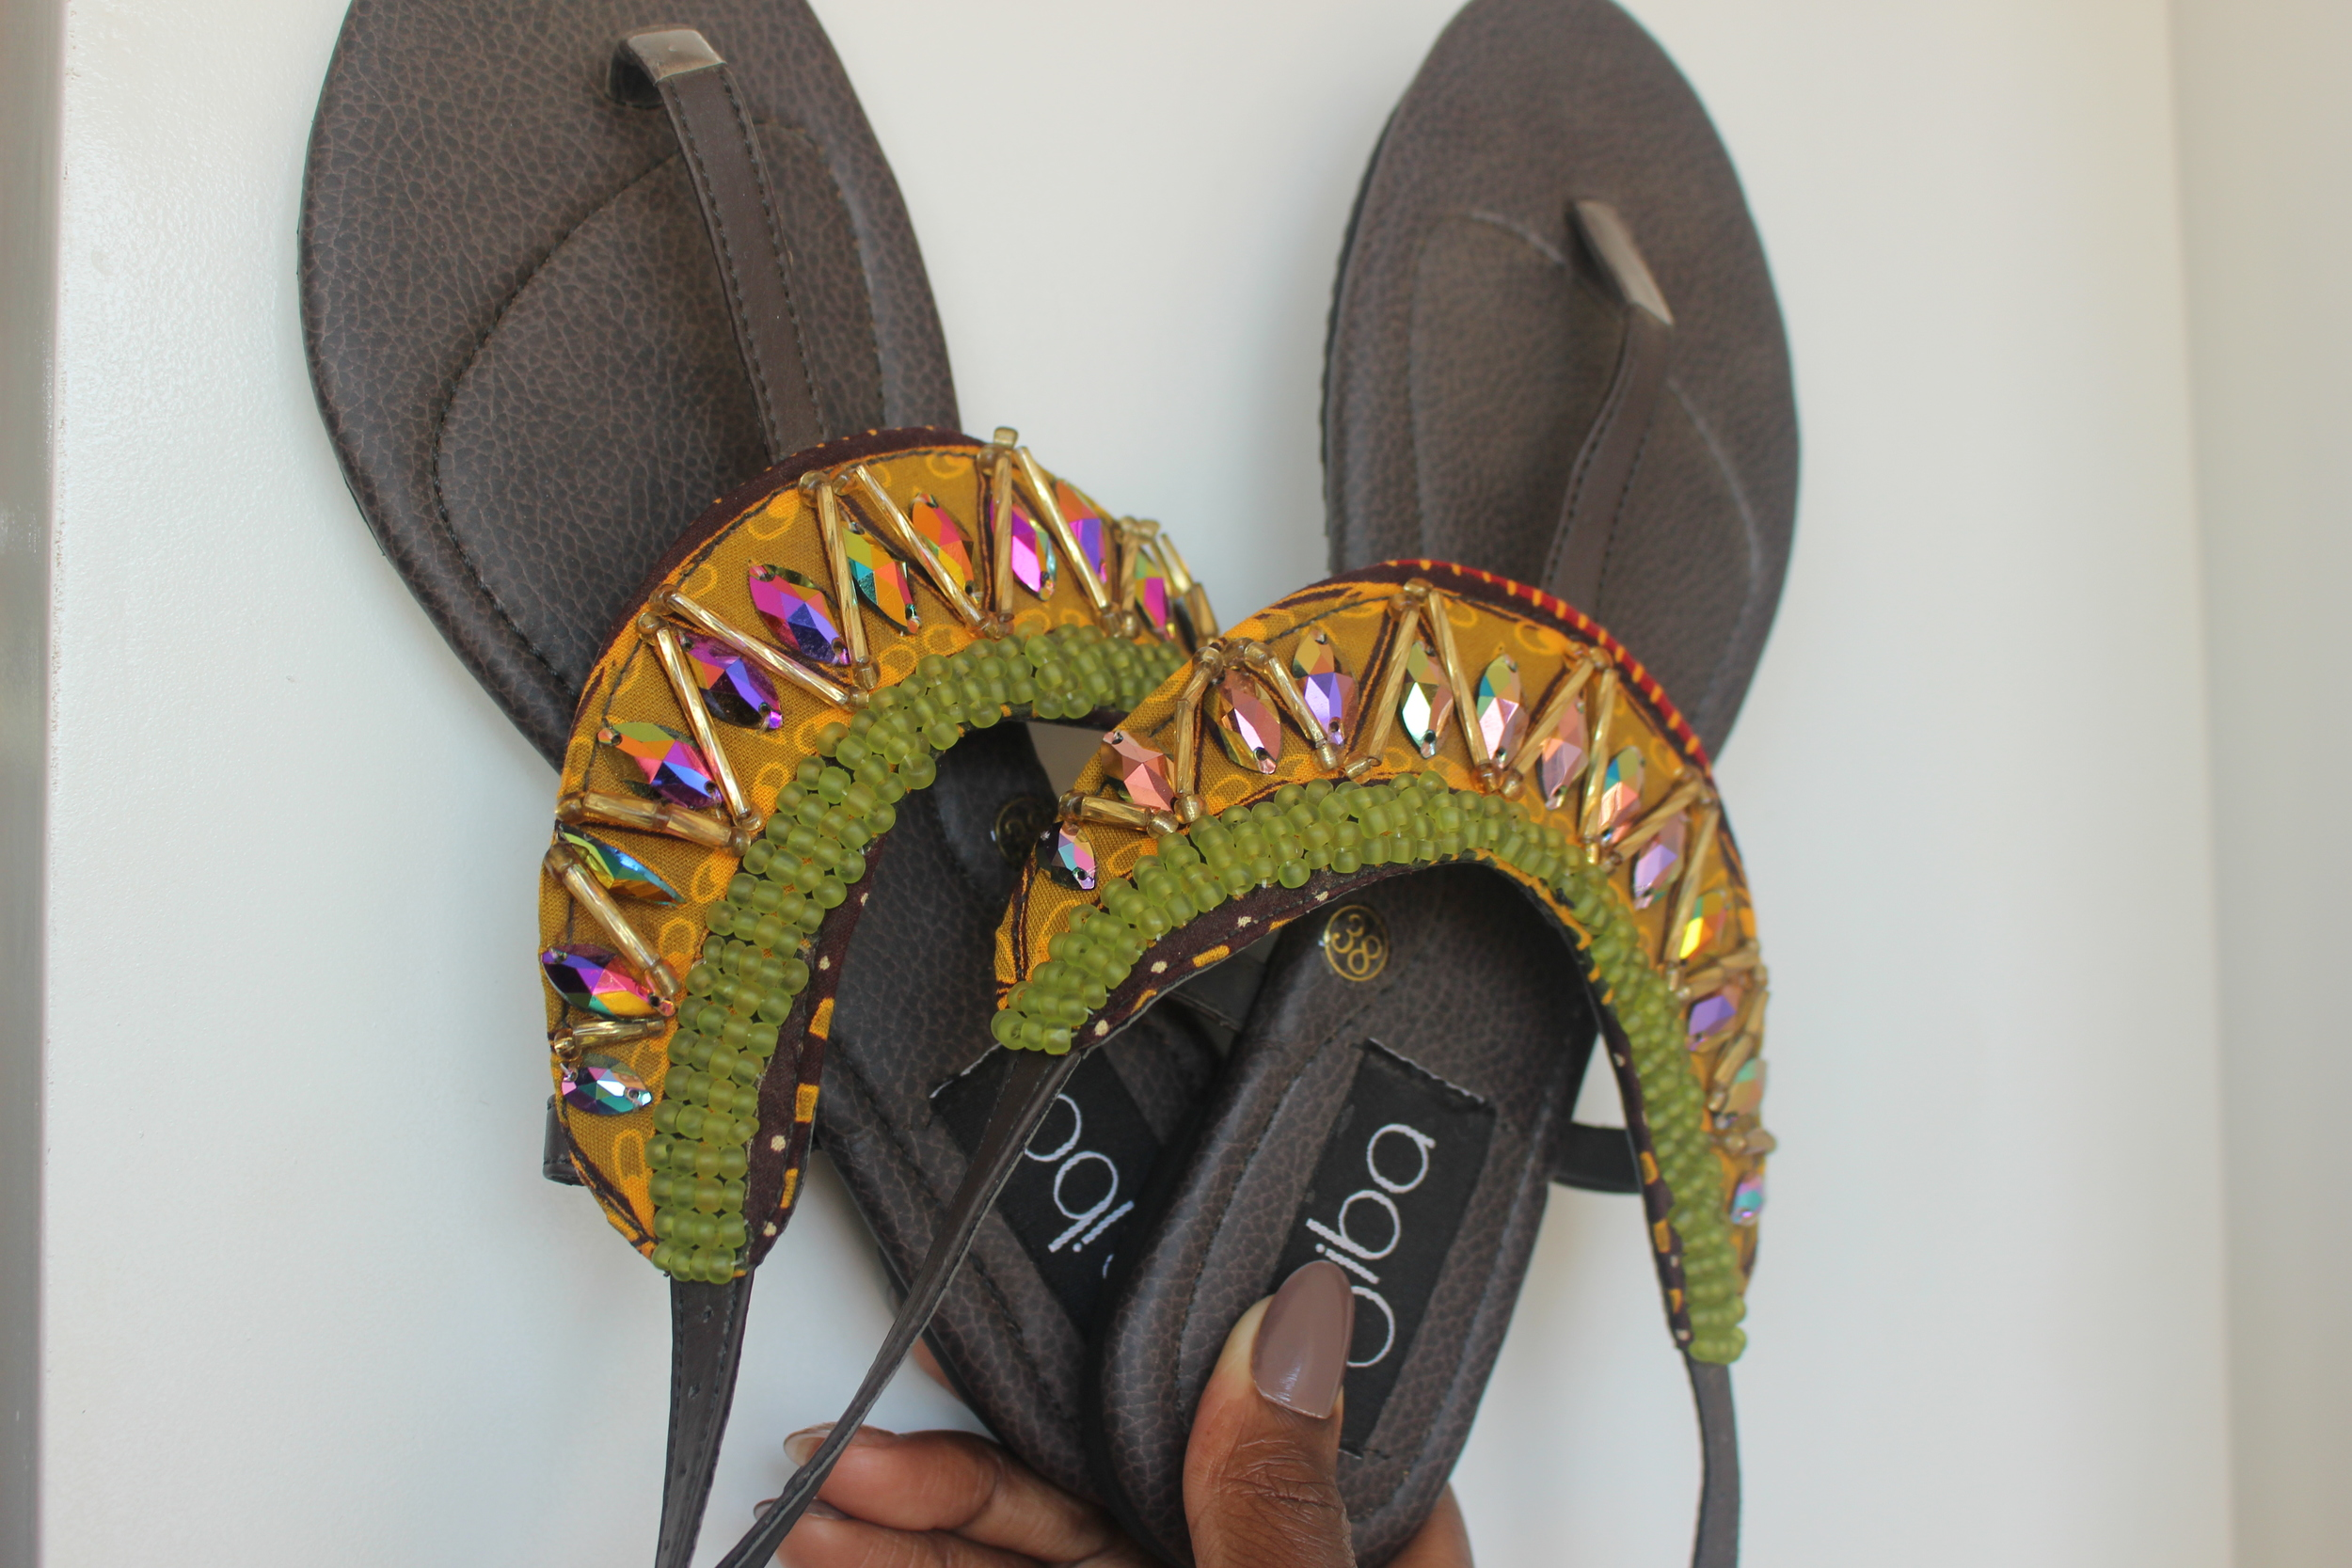 Sandals - Ghs 55